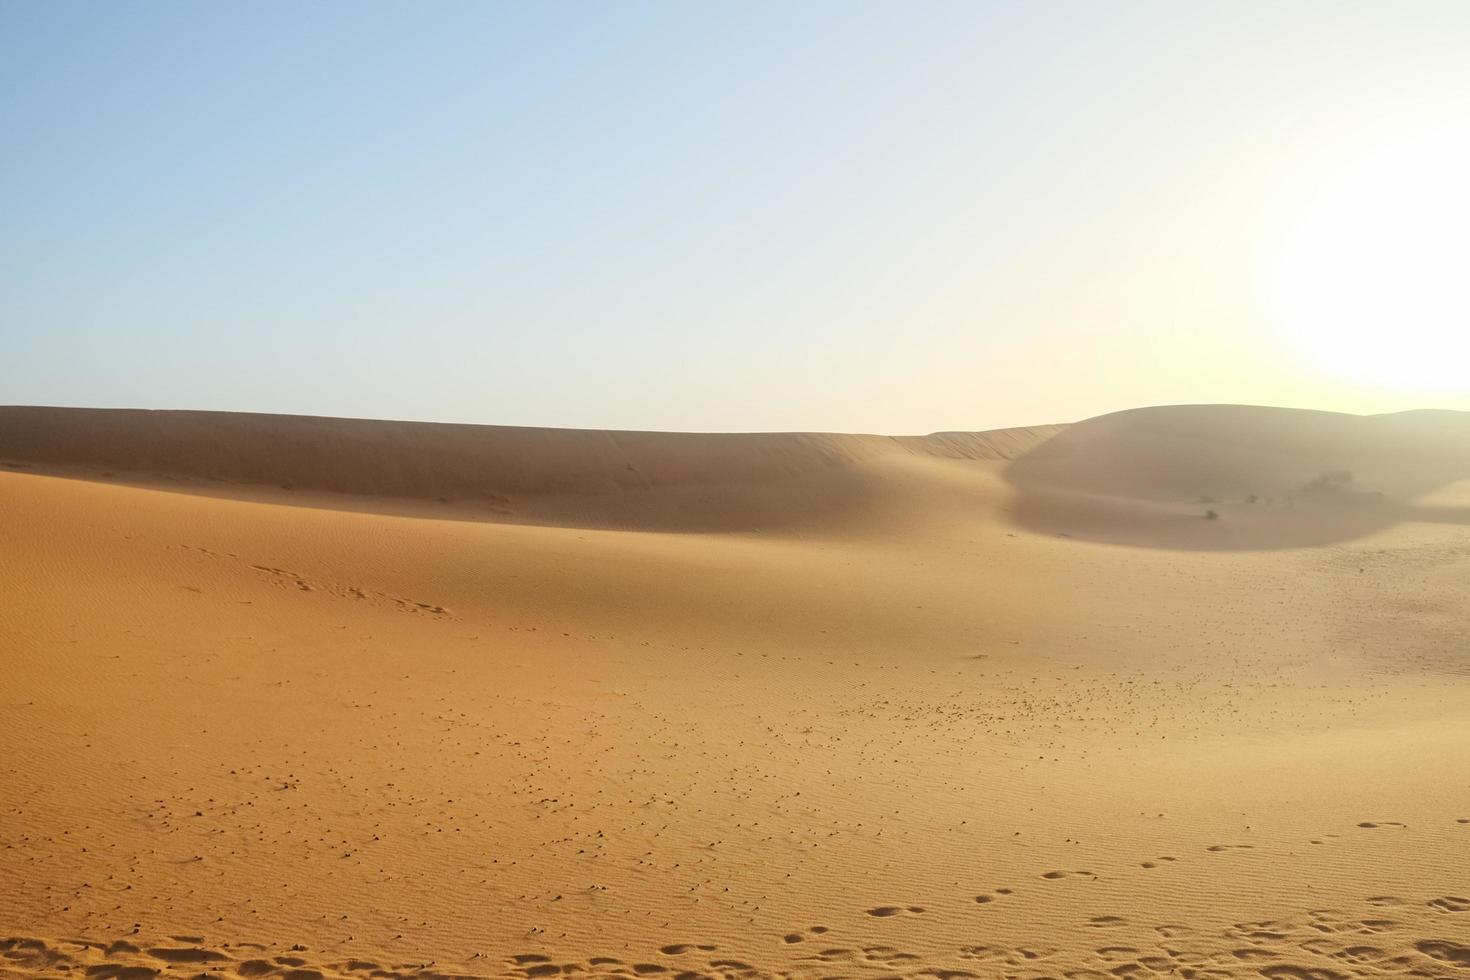 Erg Chebbi Sanddünen mit klarem blauem Himmel foto